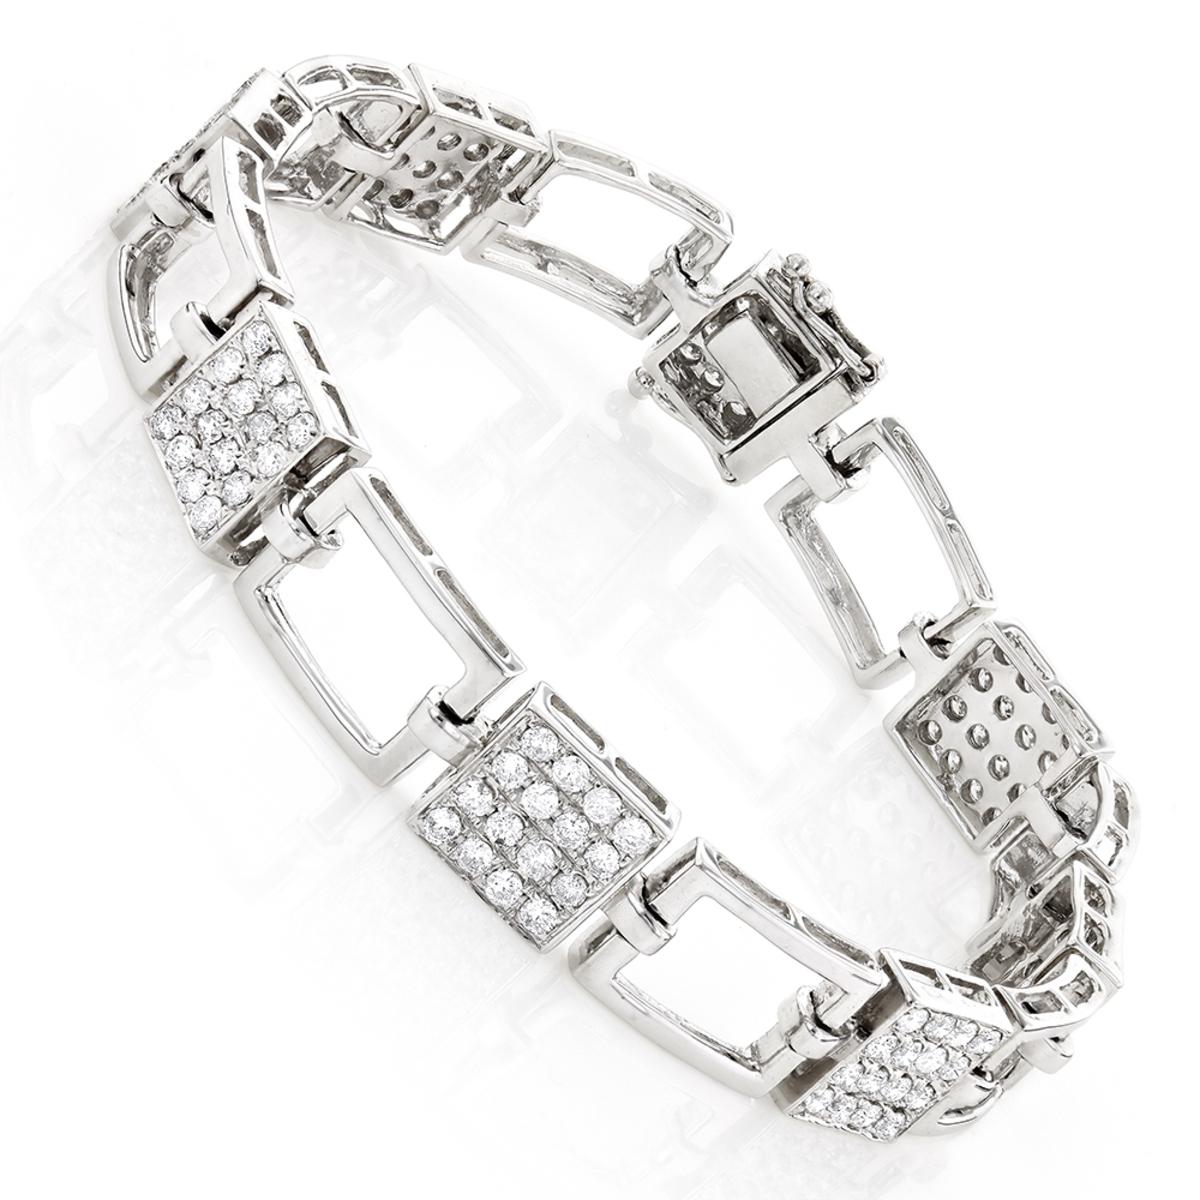 14K Gold Ladies Diamond Bracelet 2.98ct